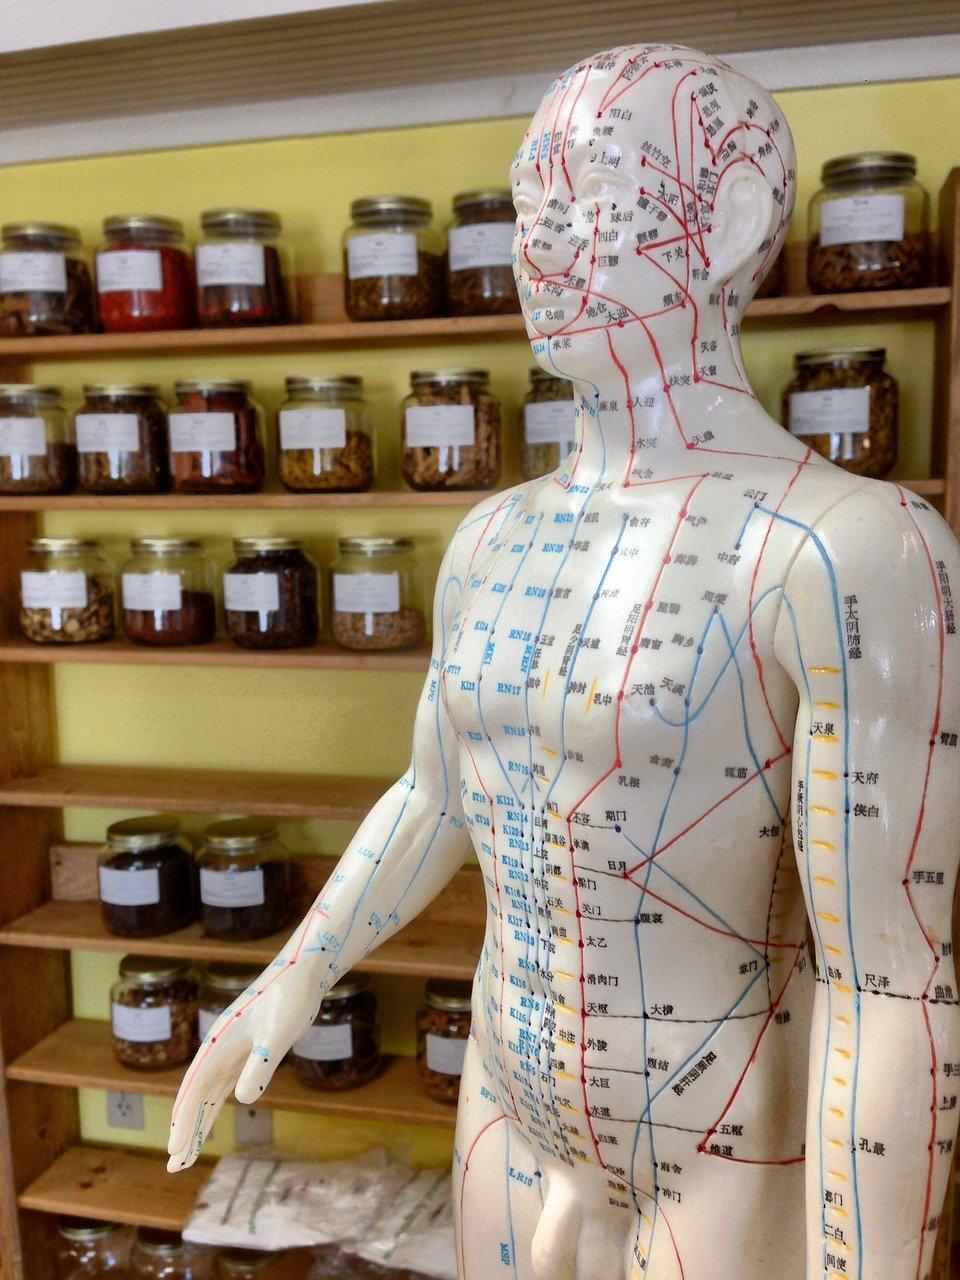 Fysiotherapie en Manuele Therapie Potappel behandeling fysiot